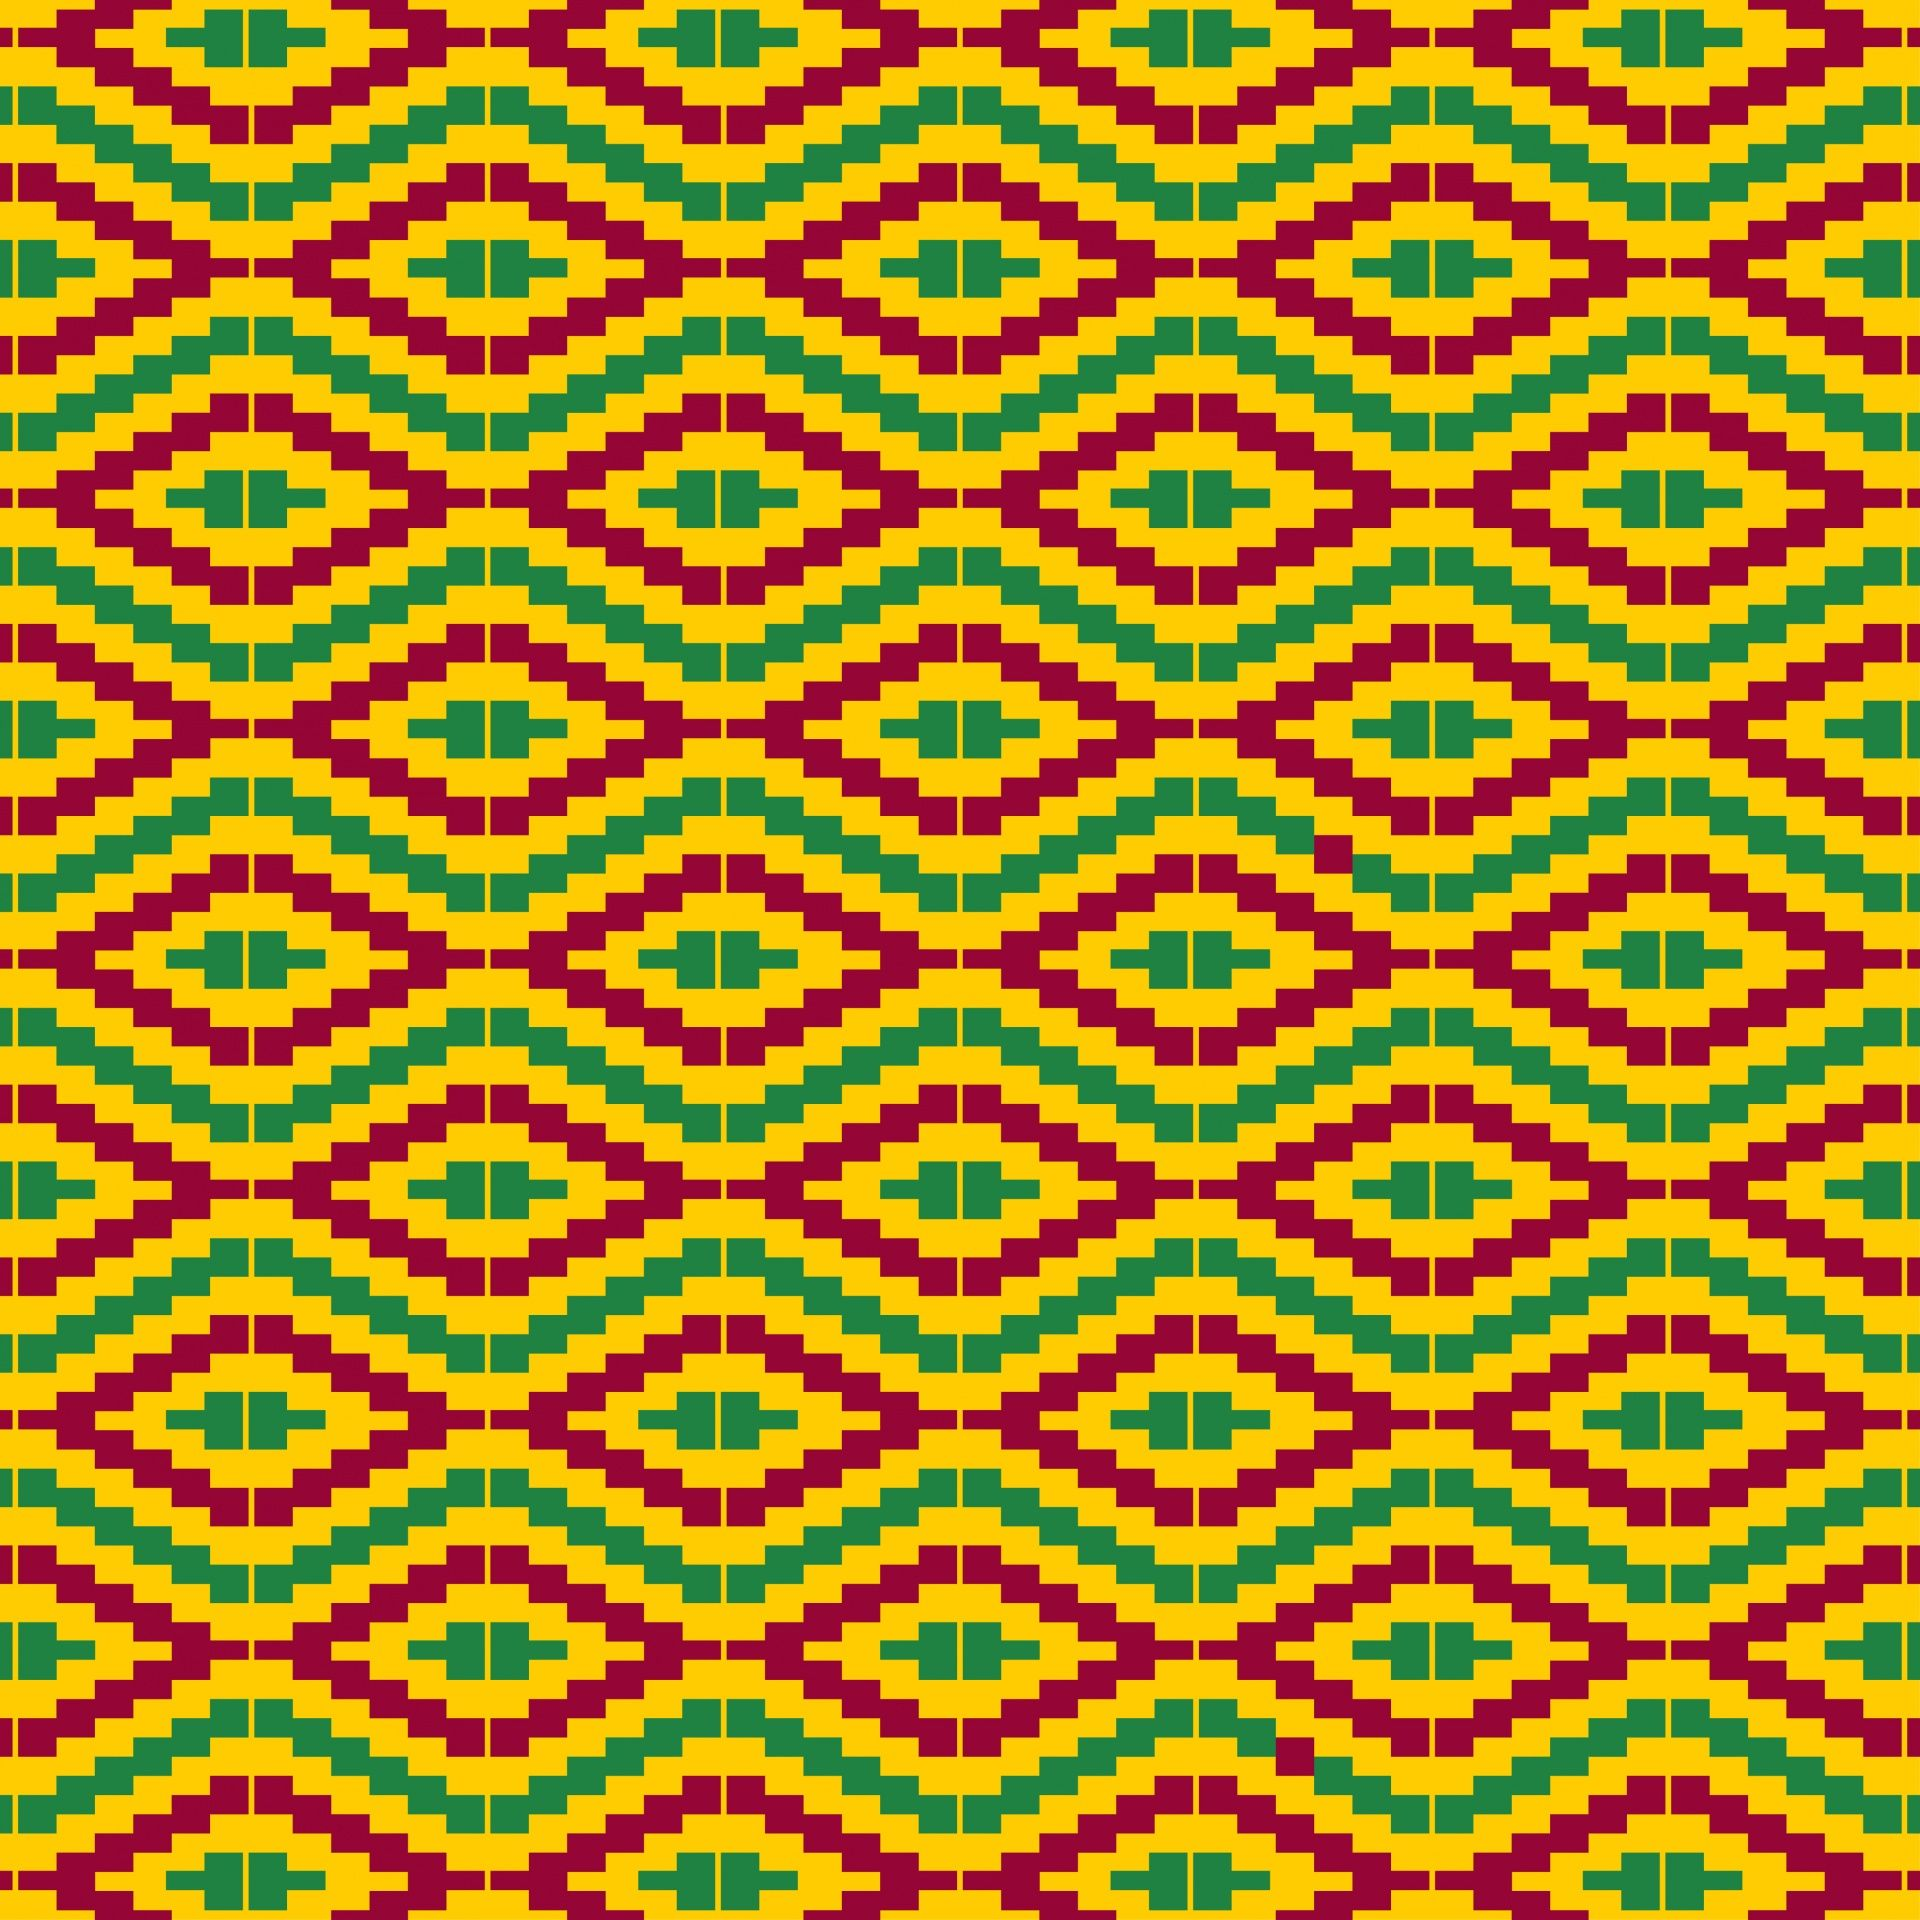 African Kente Pattern Background Background Patterns African Pattern Fabric Fabric Patterns Design